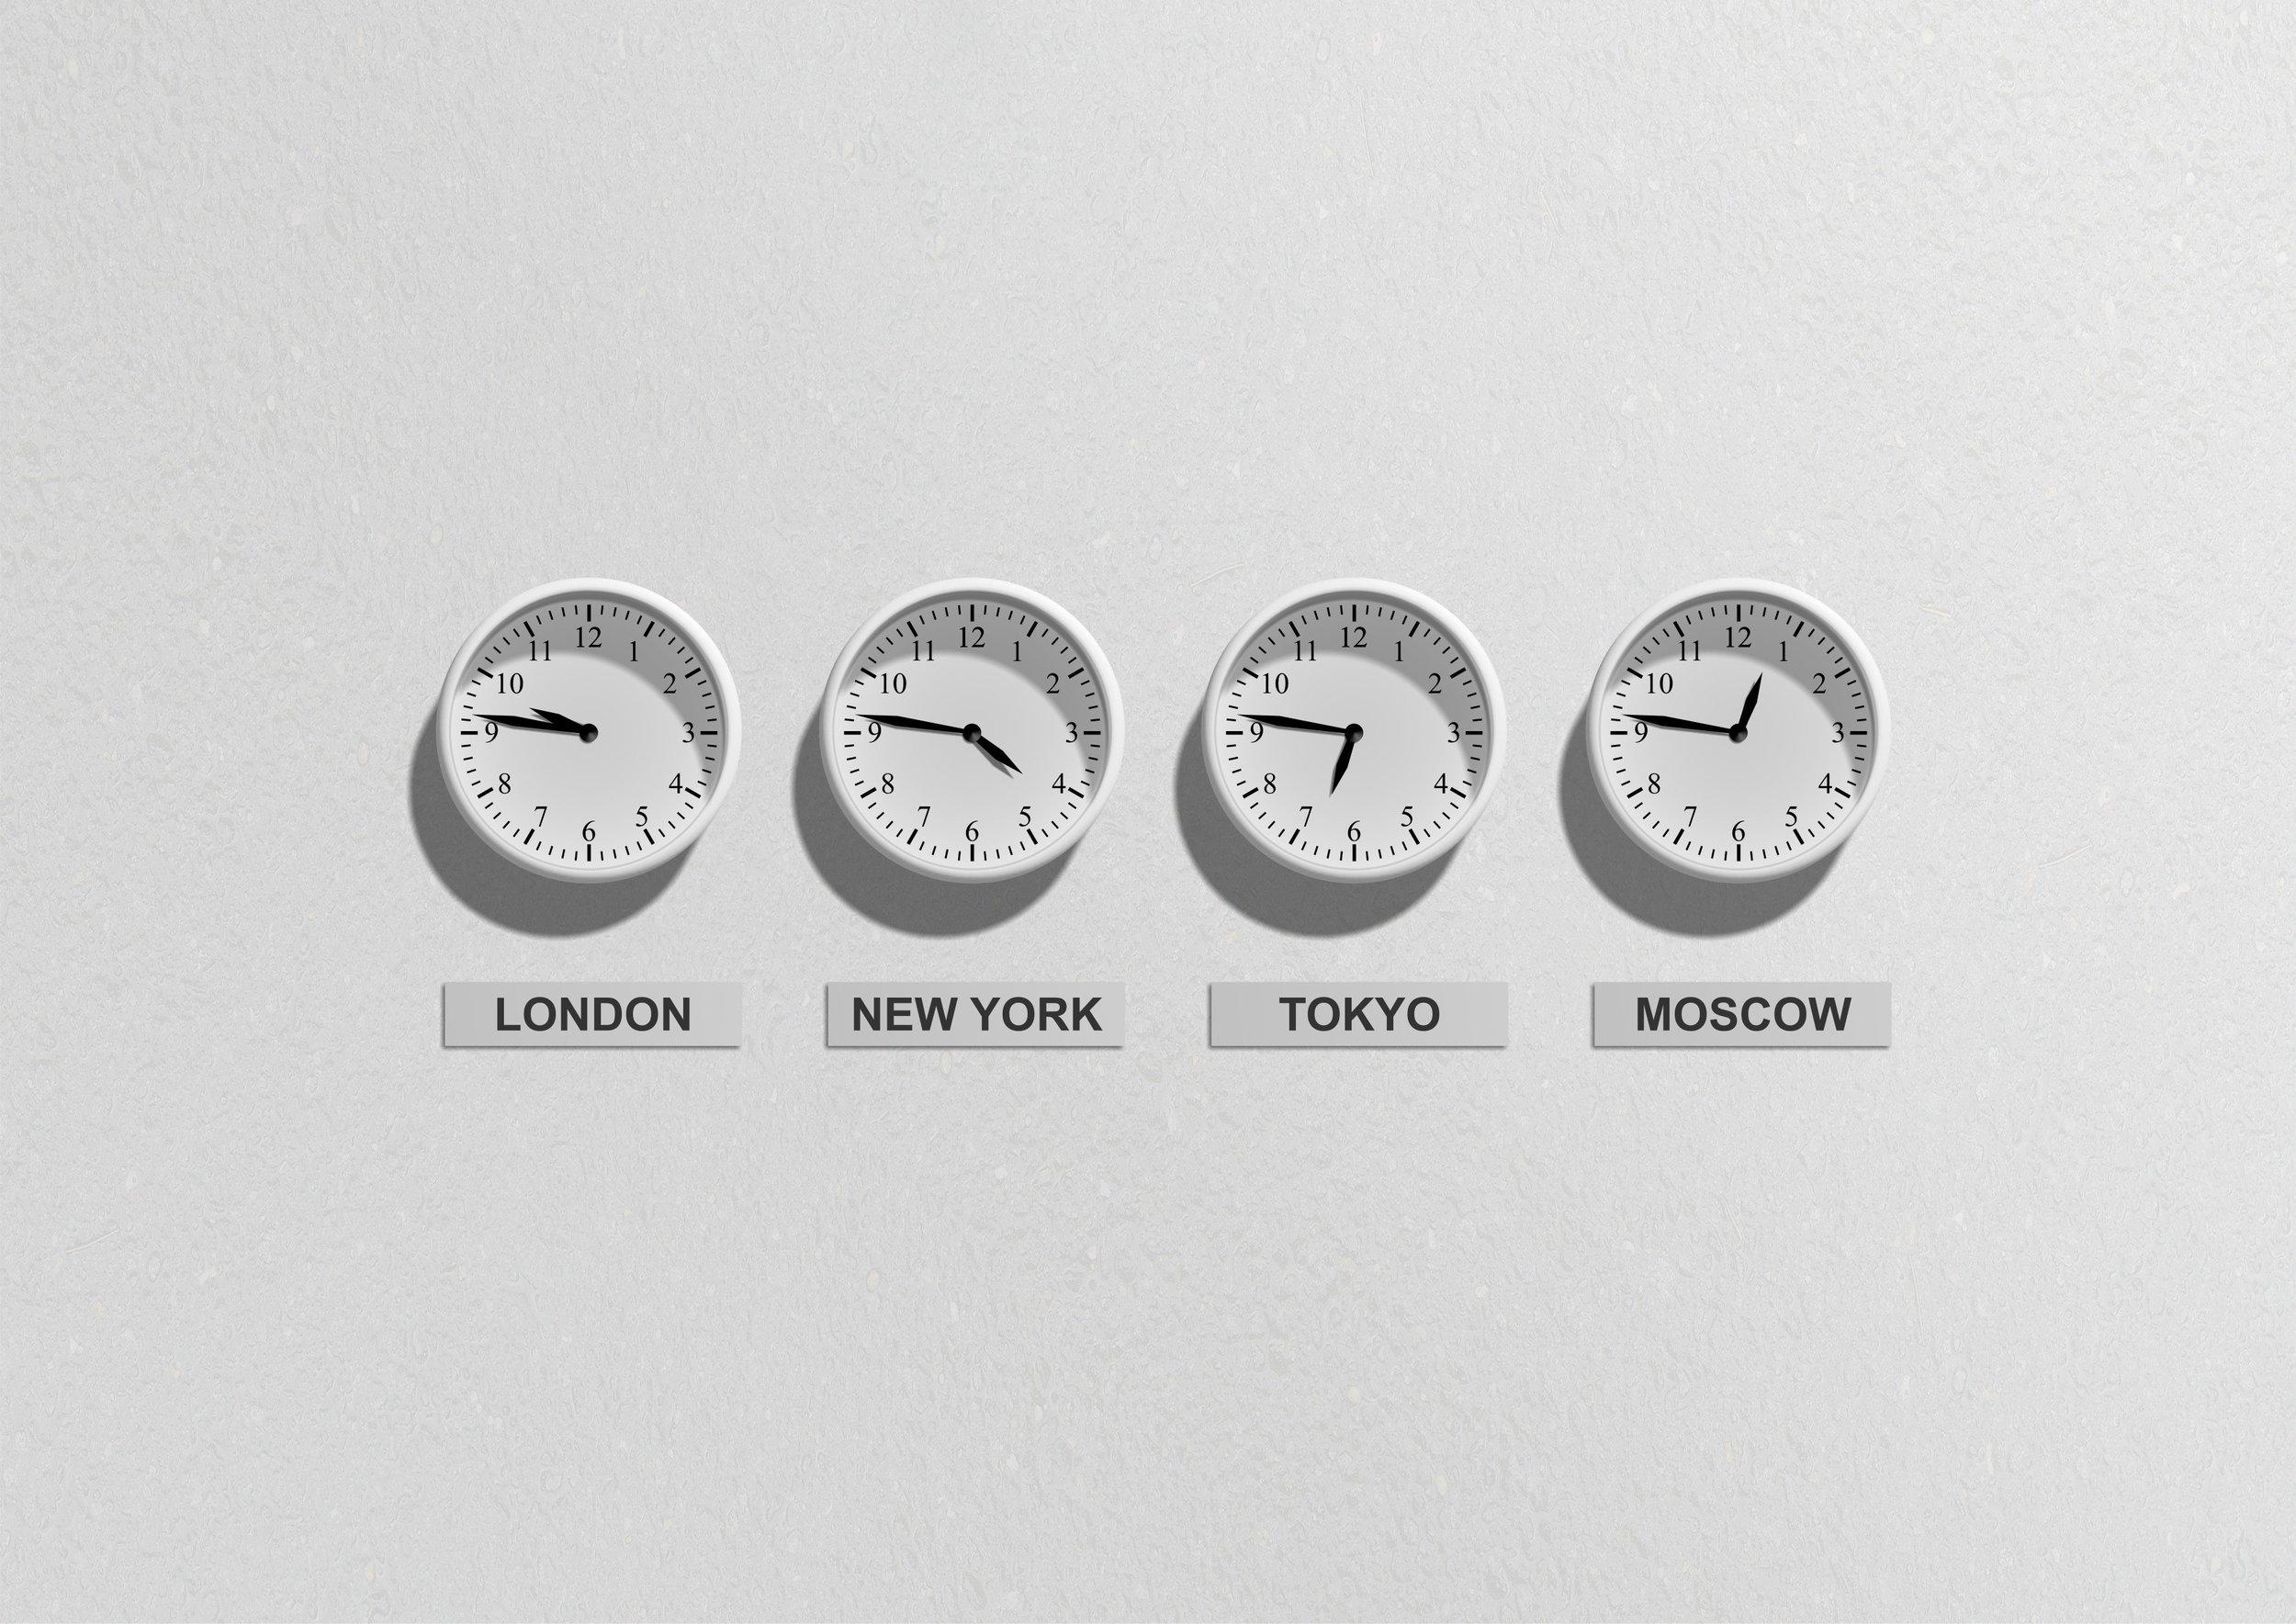 black-business-clocks-48770.jpg